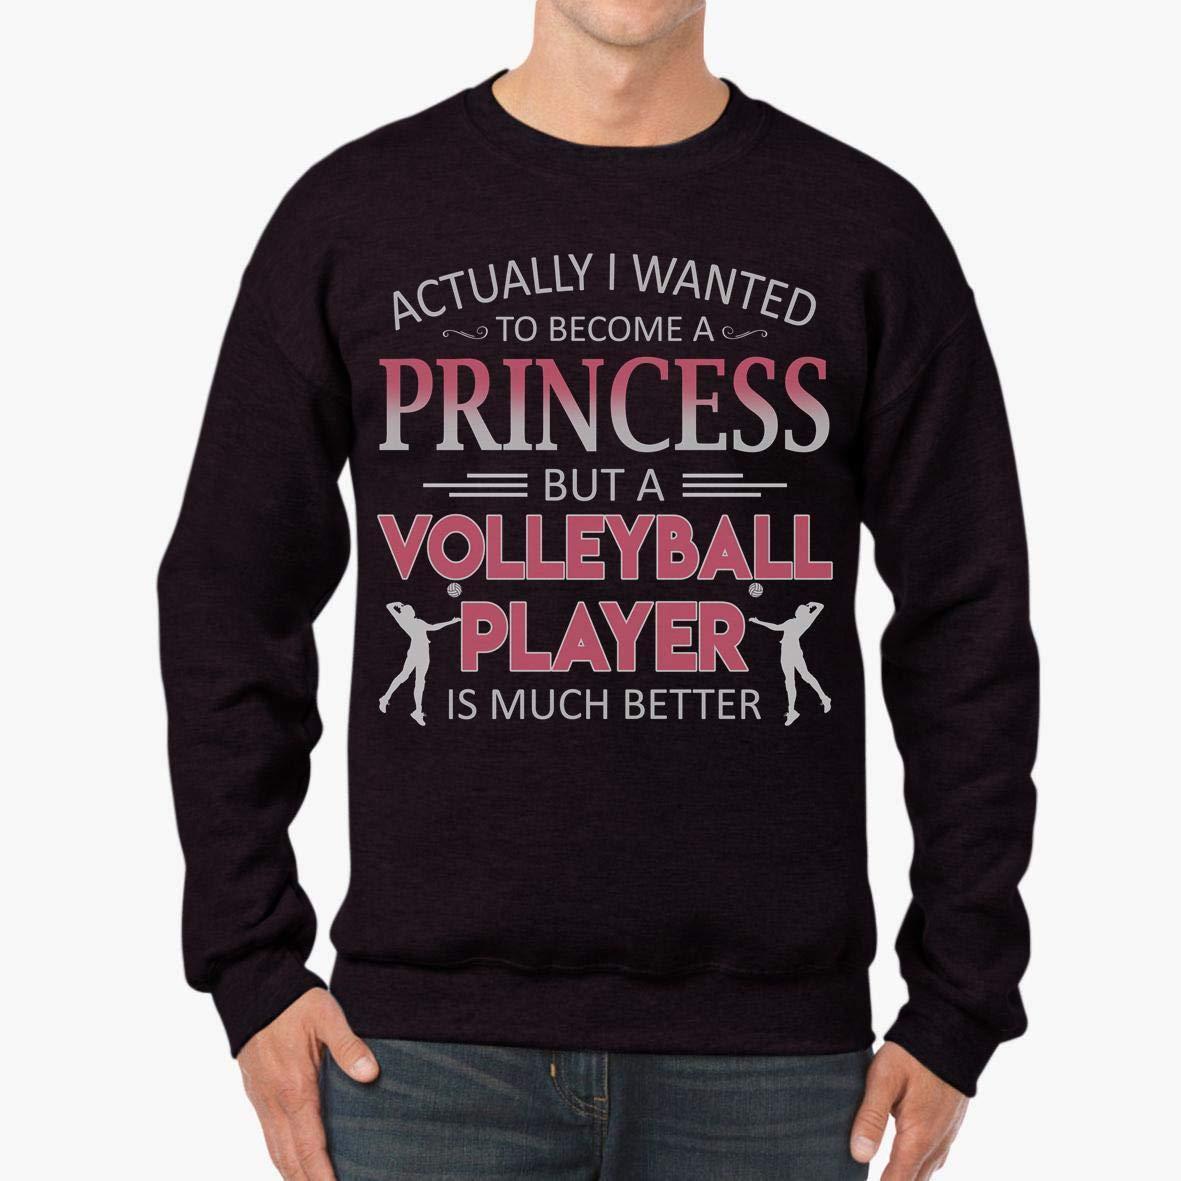 tee Doryti A Volleyball Player is Much Better Unisex Sweatshirt